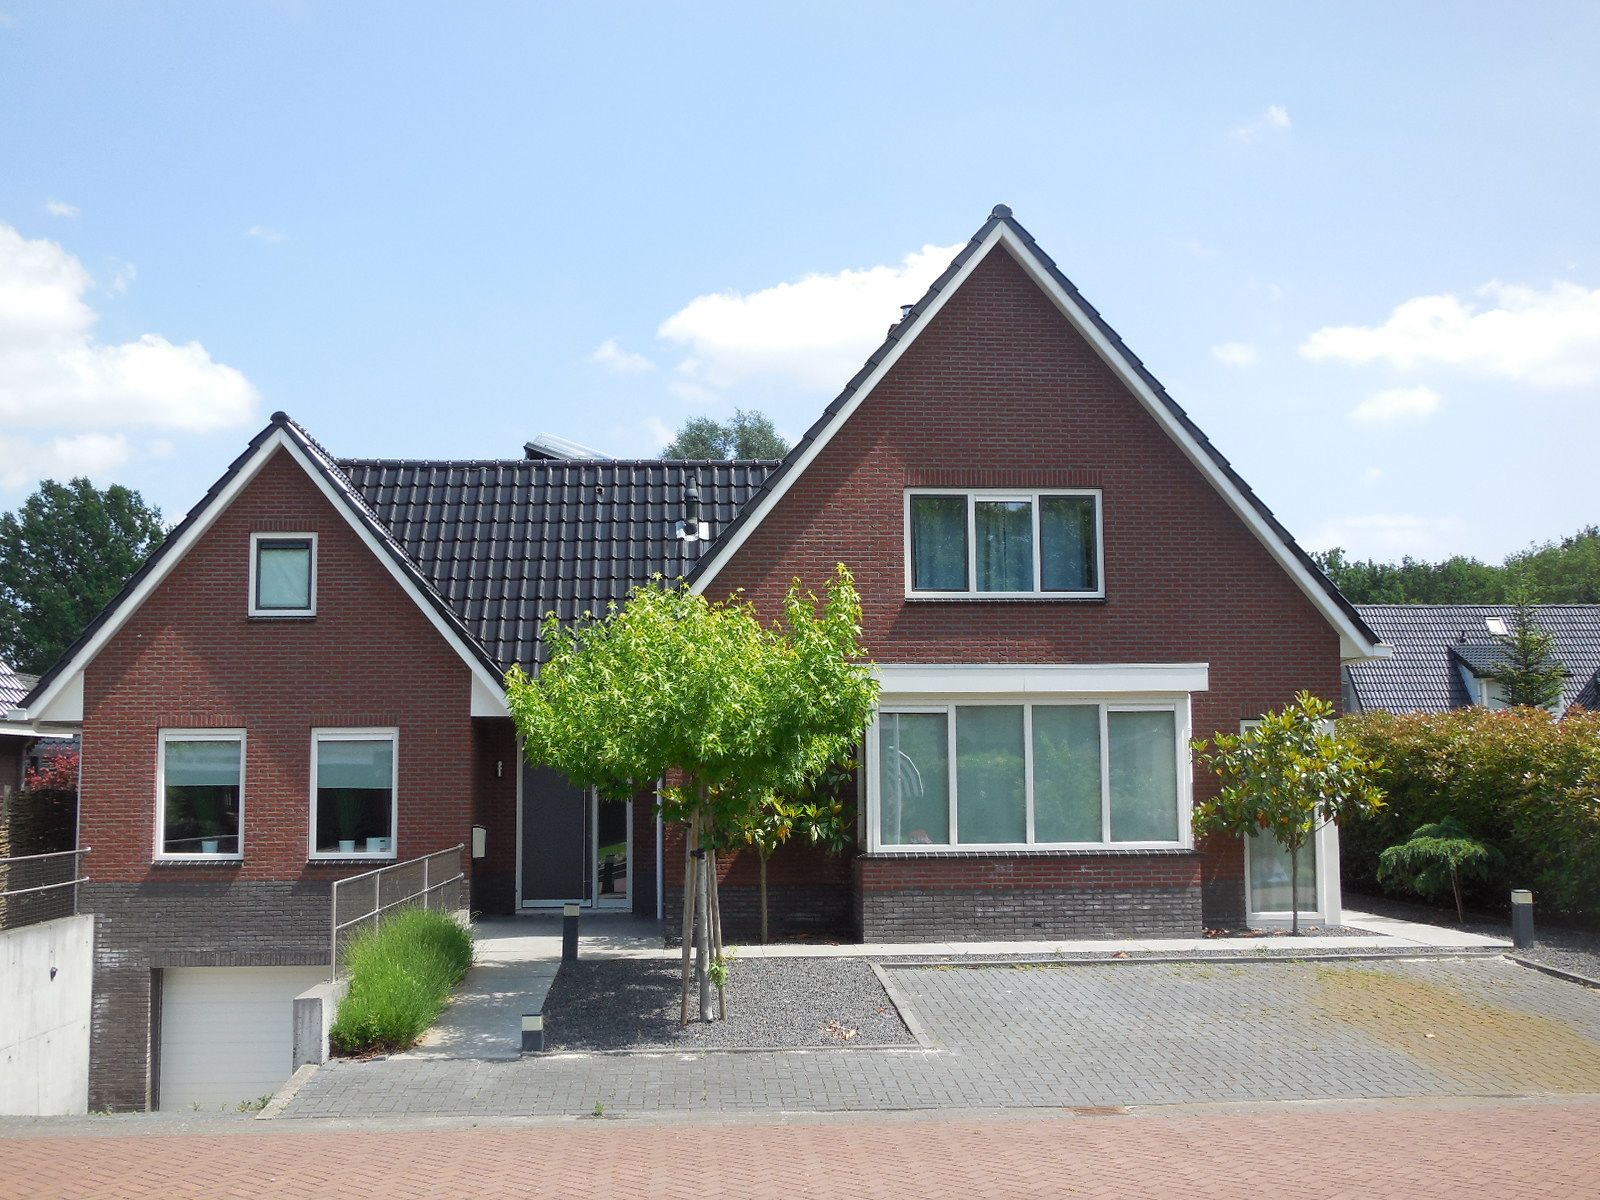 Breikom 20, Oosterwolde